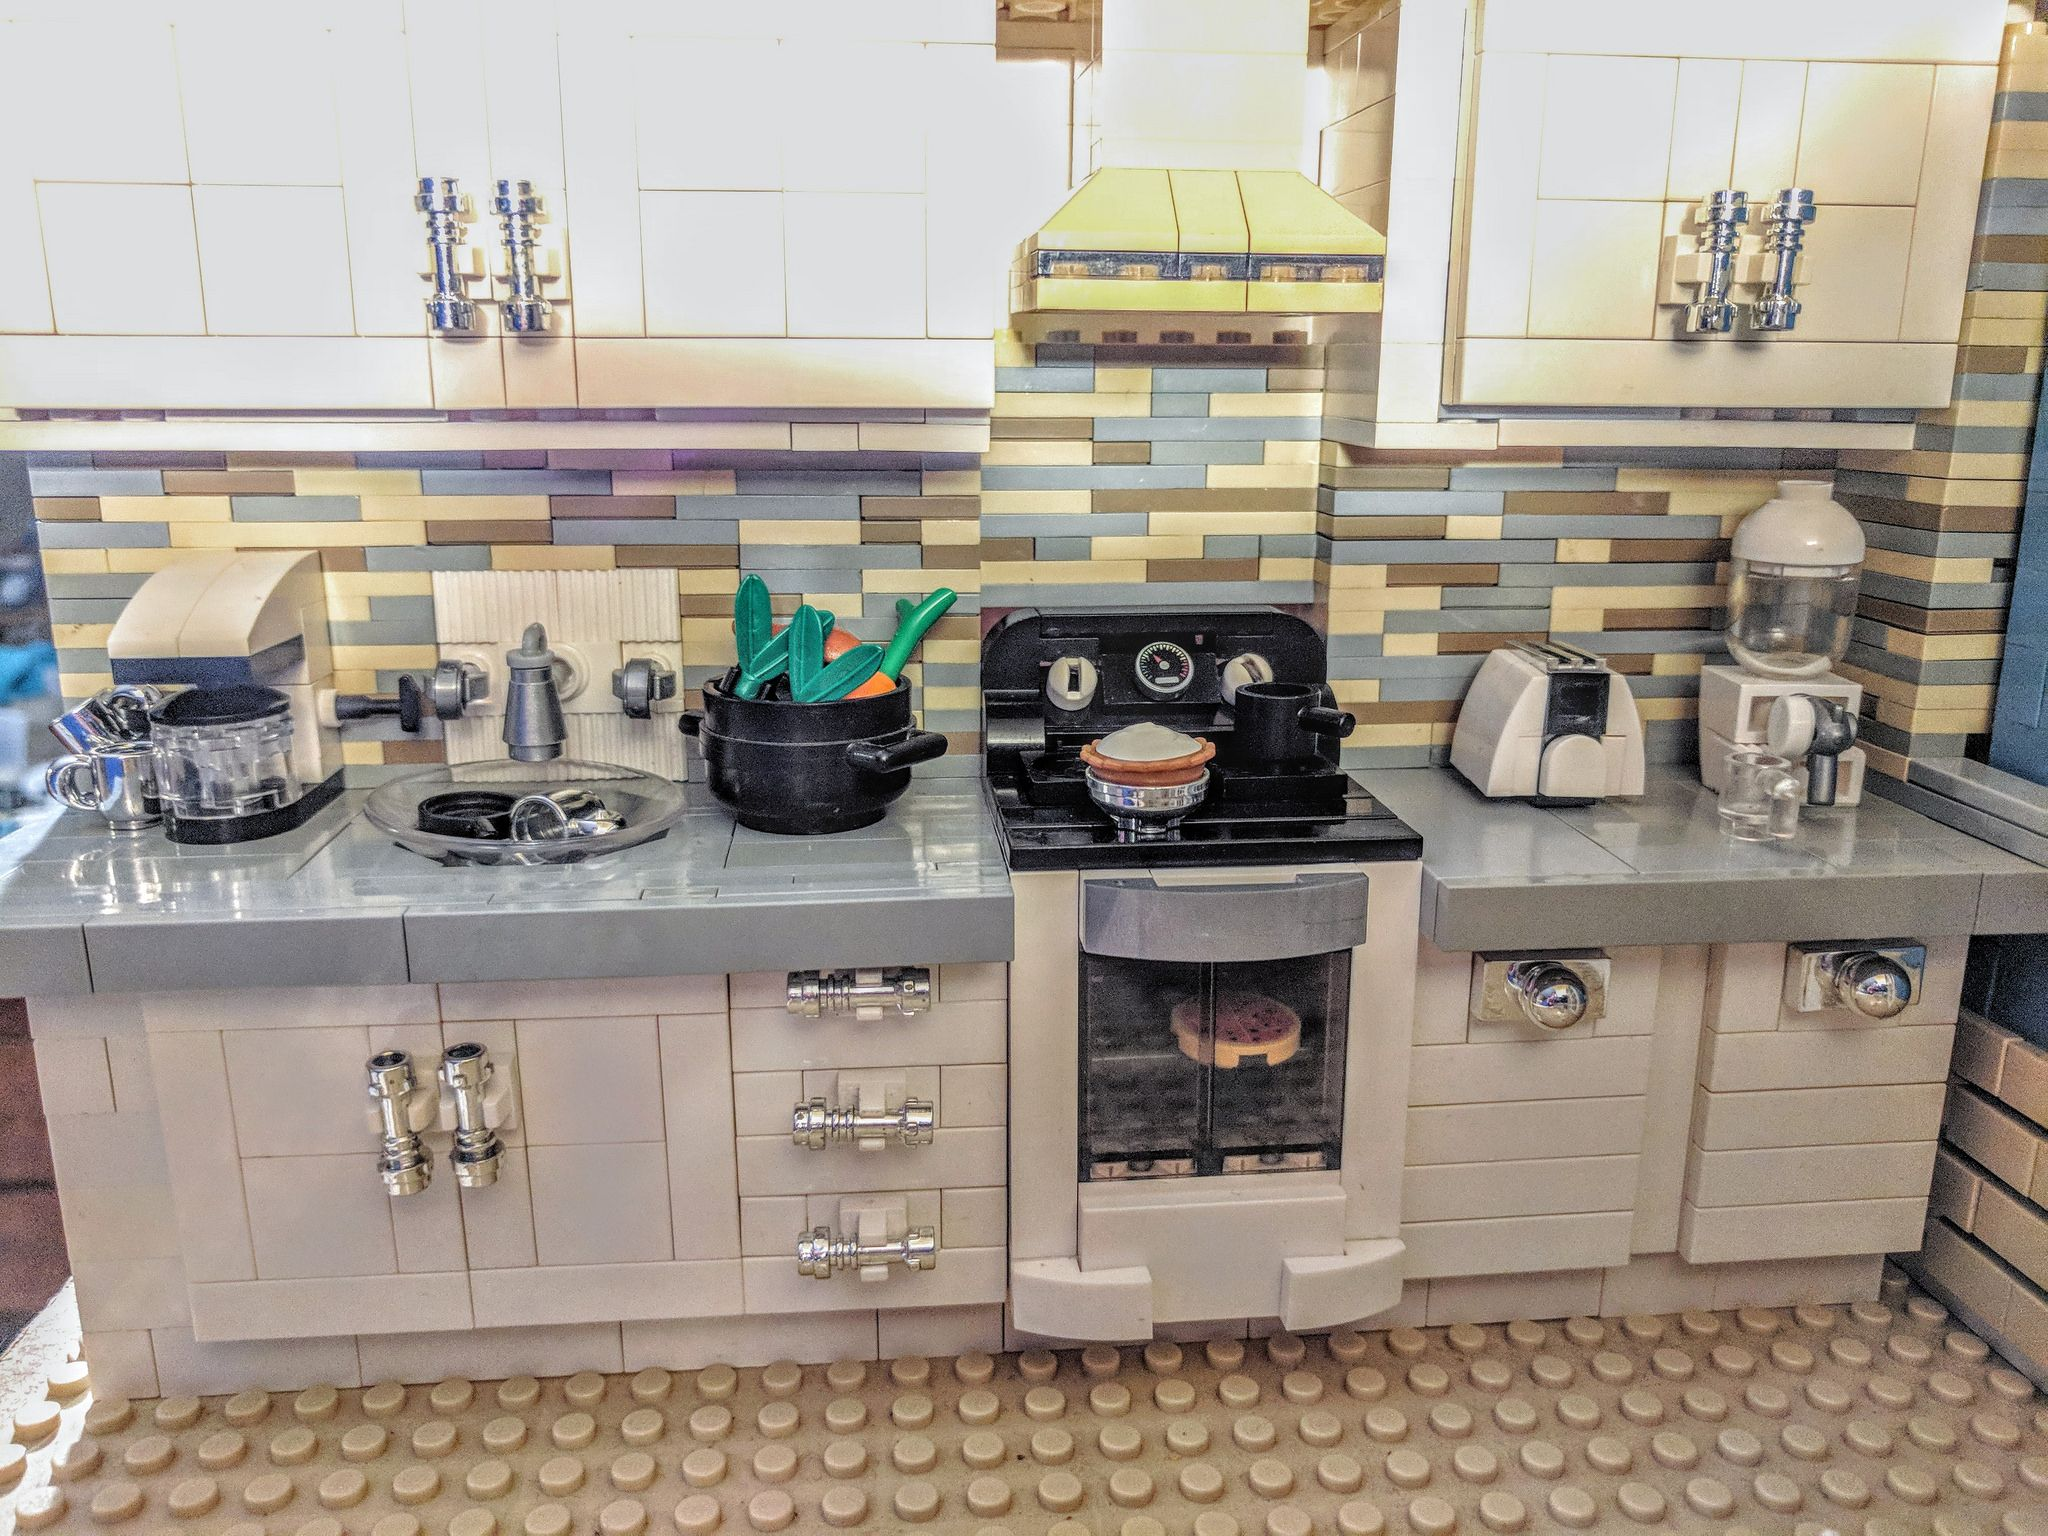 Best Modern Lego Kitchen Lego Kitchen Lego Furniture Lego 400 x 300